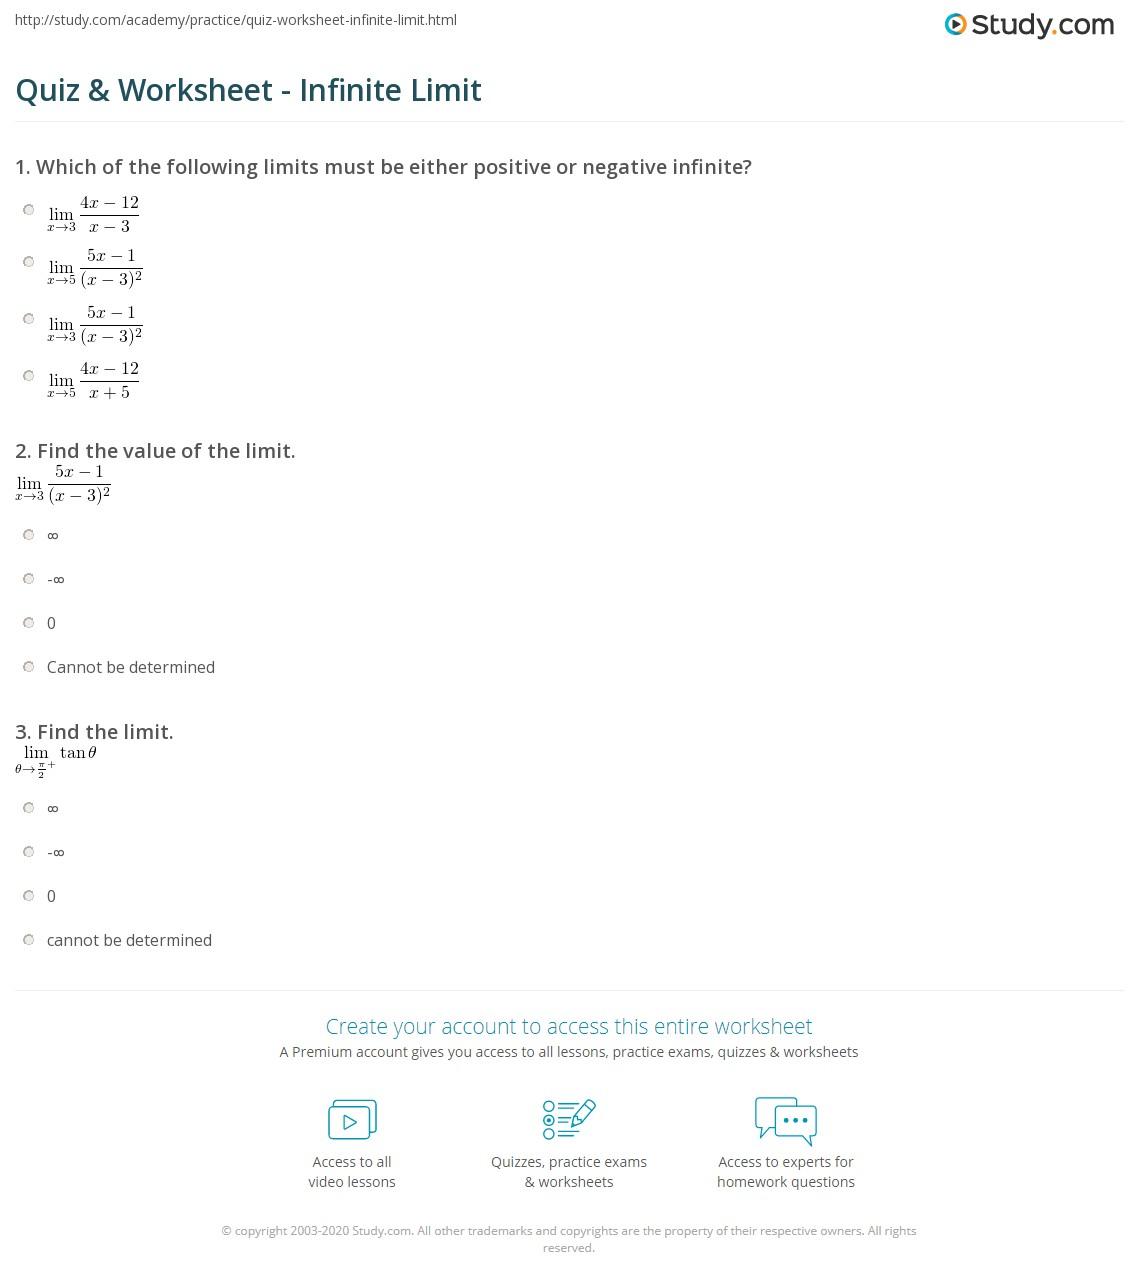 Quiz & Worksheet - Infinite Limit | Study.com